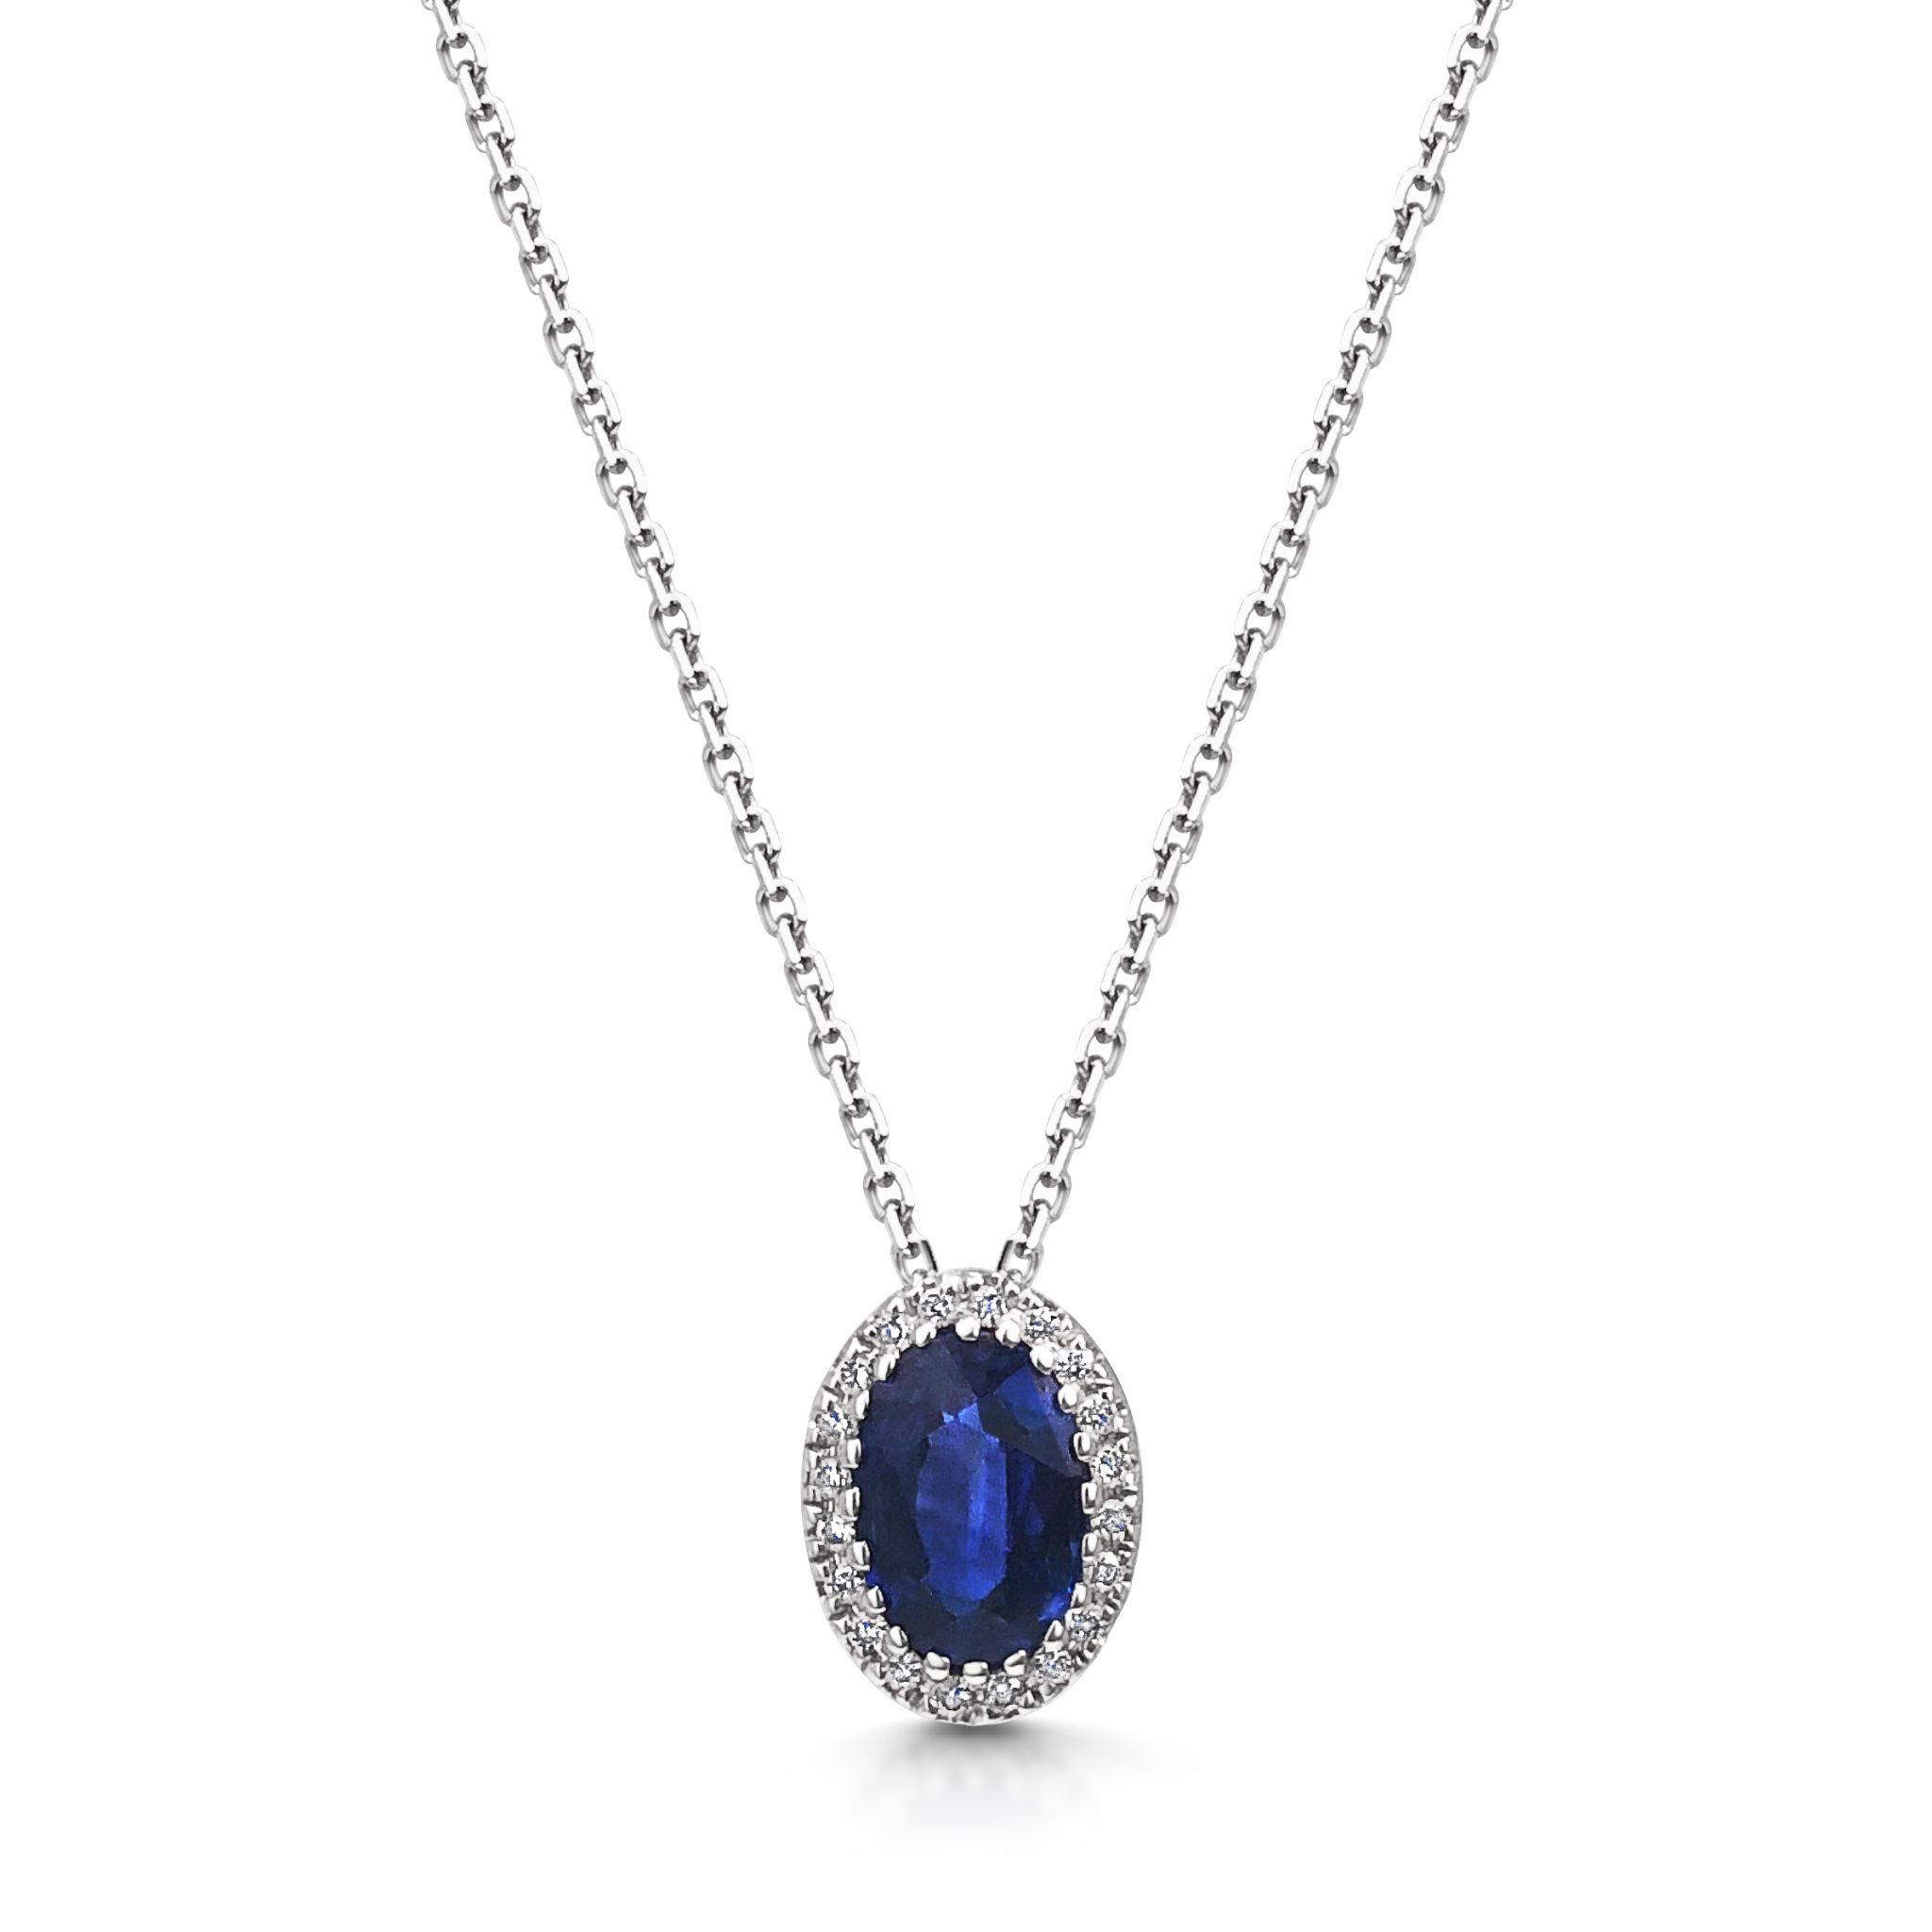 The easy way to buy jewellery.